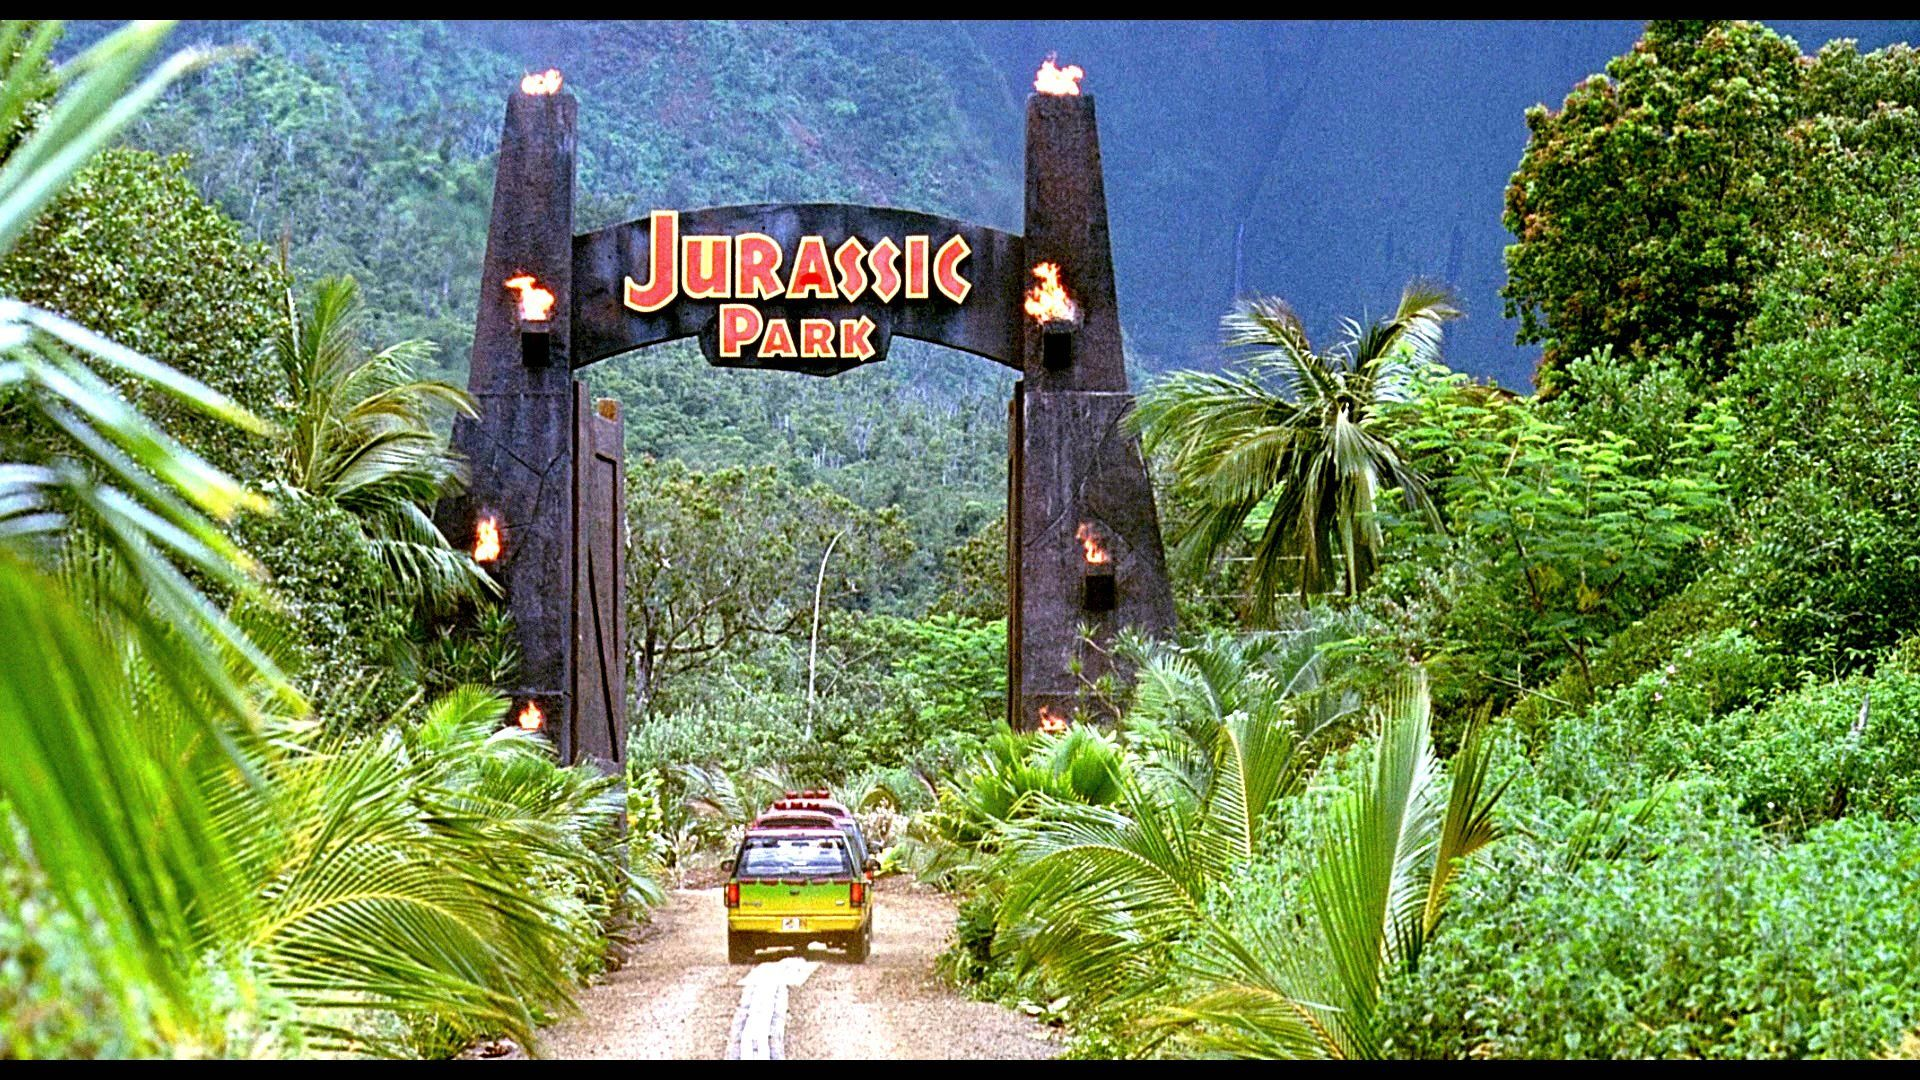 Jurassic Park Wallpapers High Resolution For Desktop Wallpaper